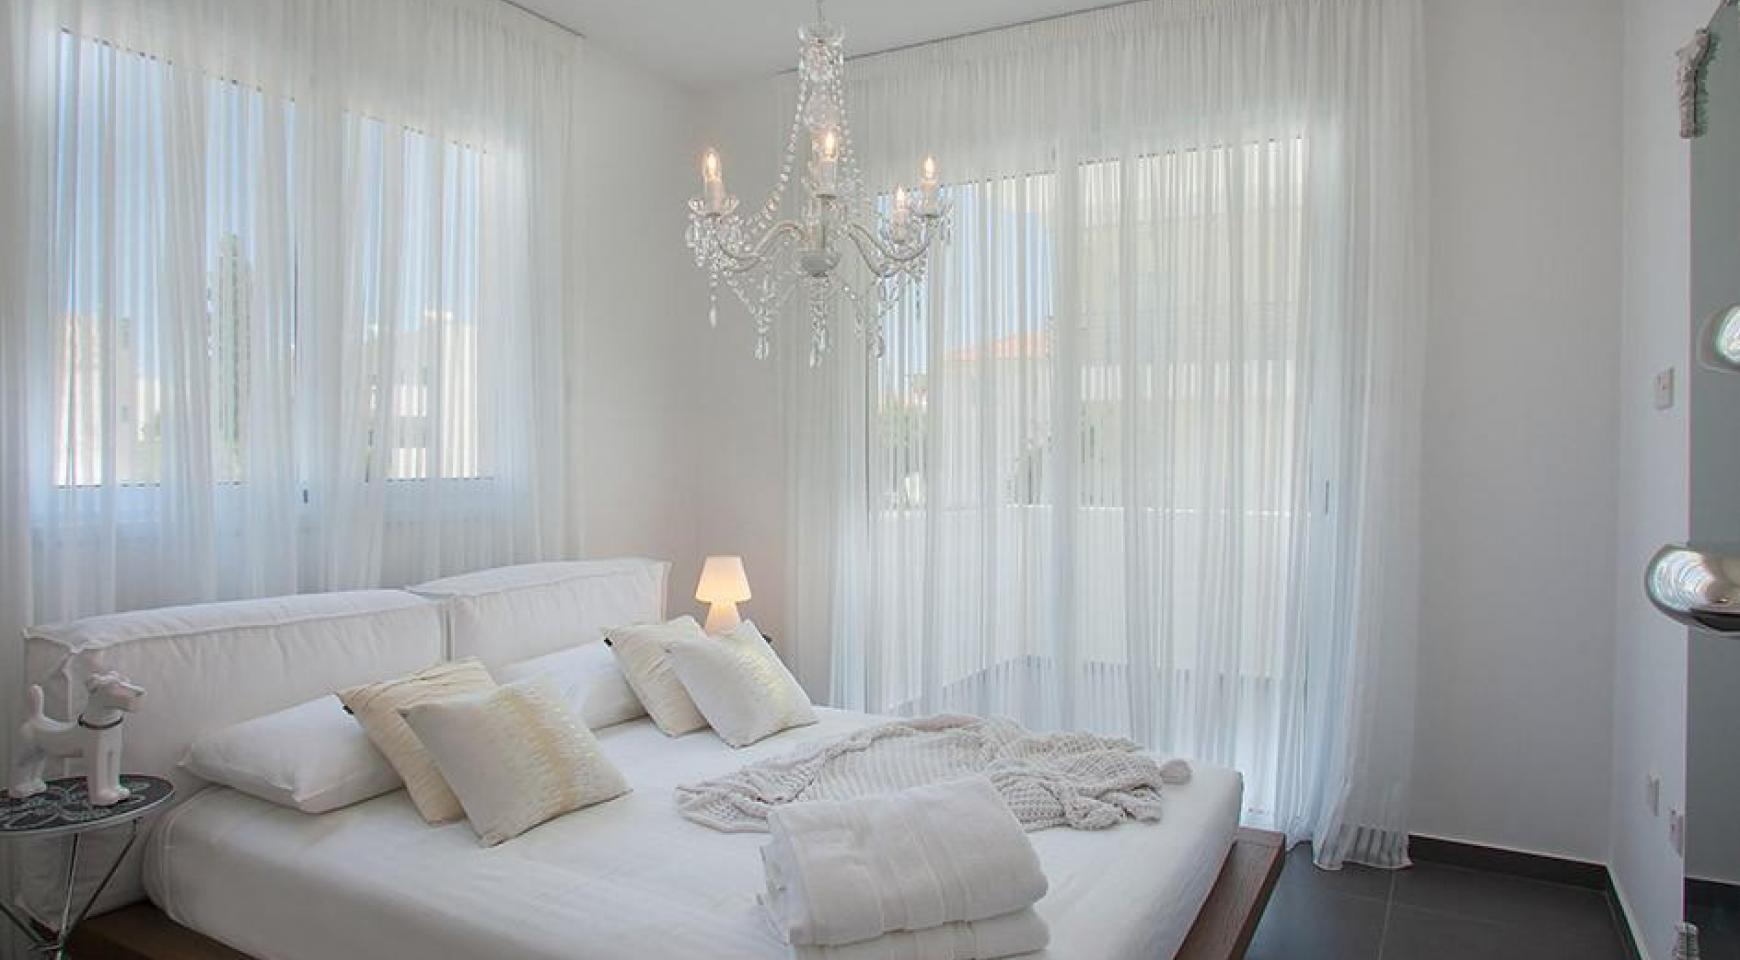 New 2 Bedroom Apartment in Kapparis - 4